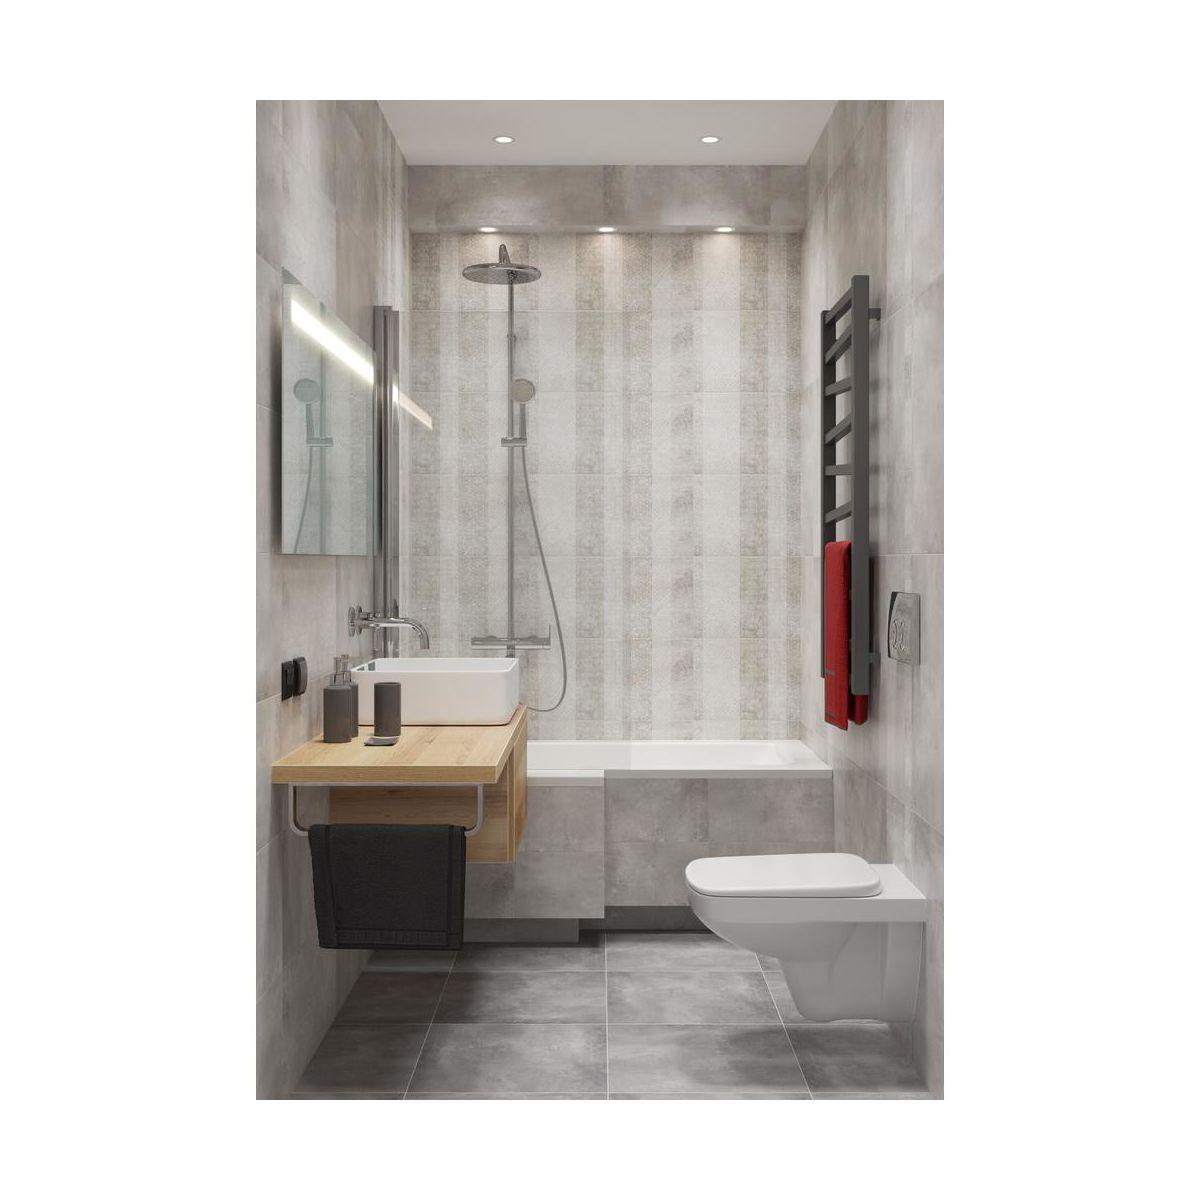 Wanna Asymetryczna Sensea Bathroom Toilet